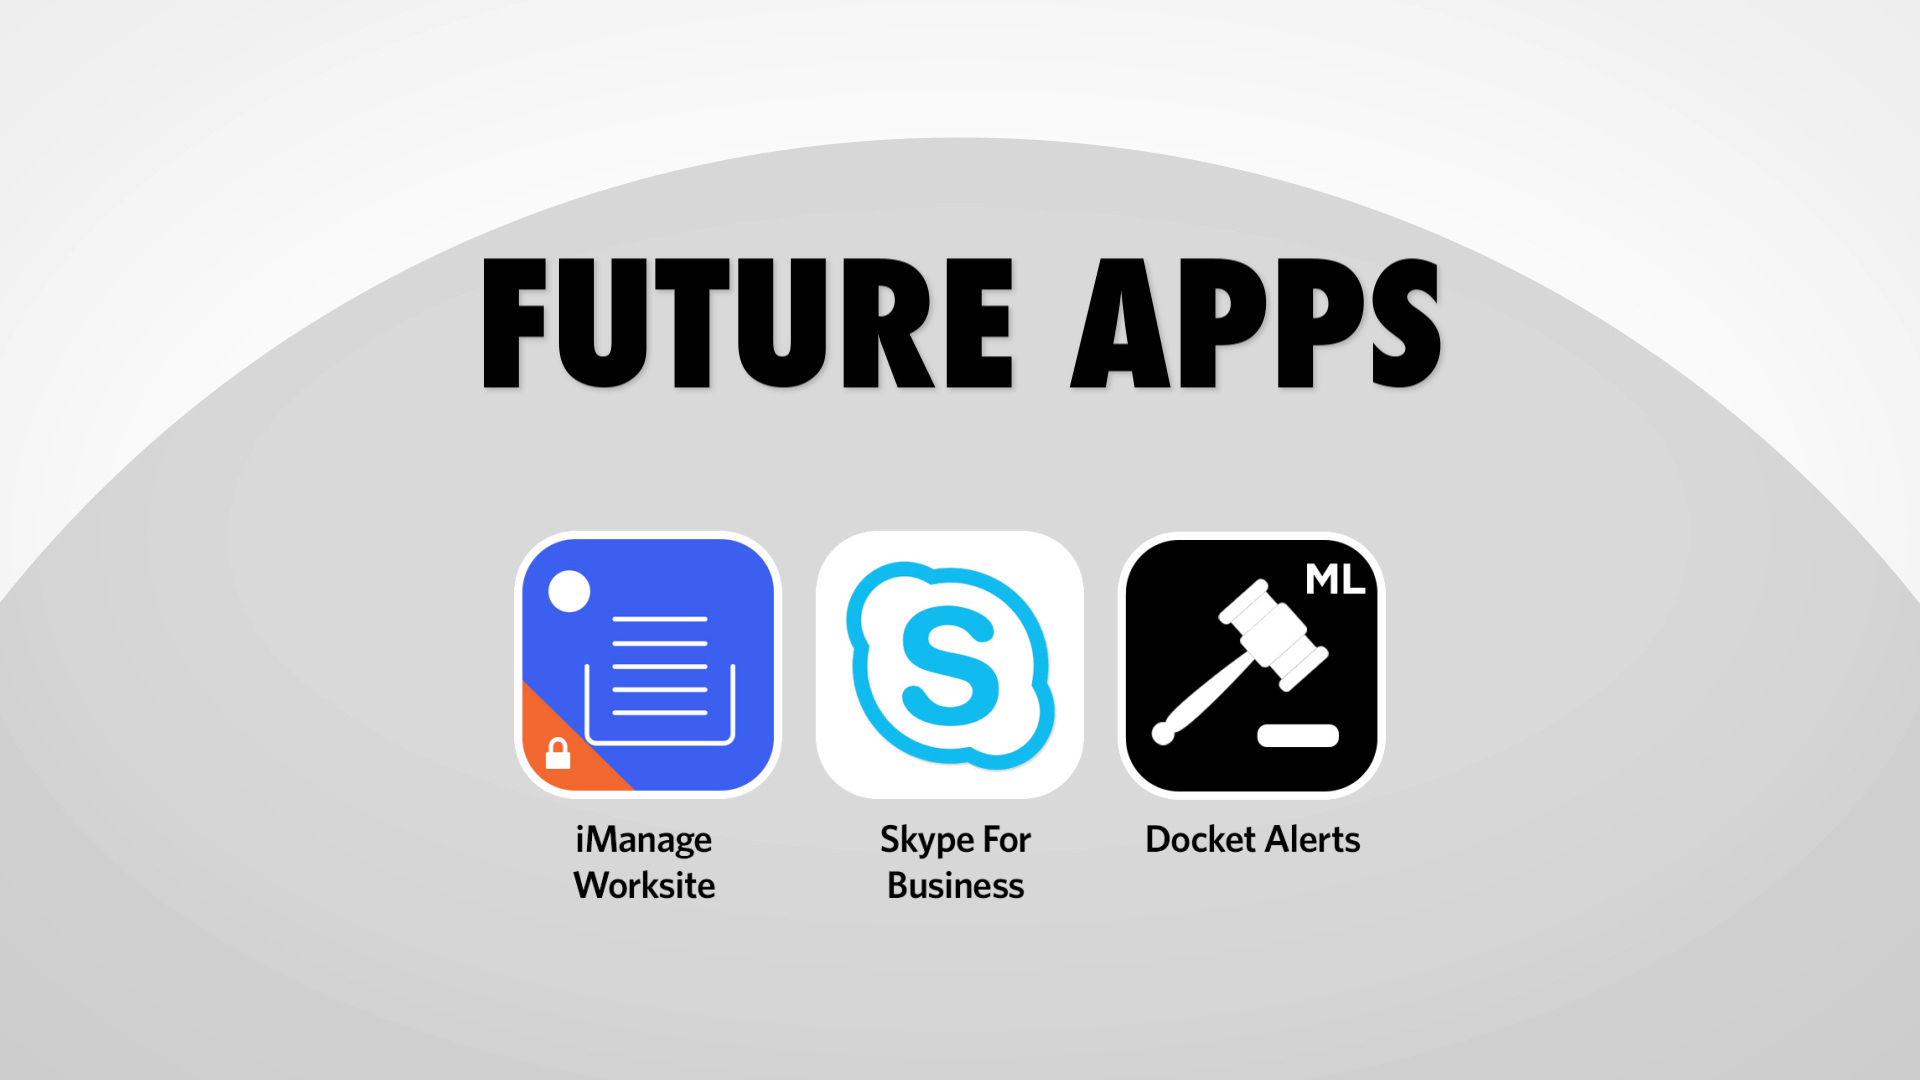 Morgan Lewis: Future Apps